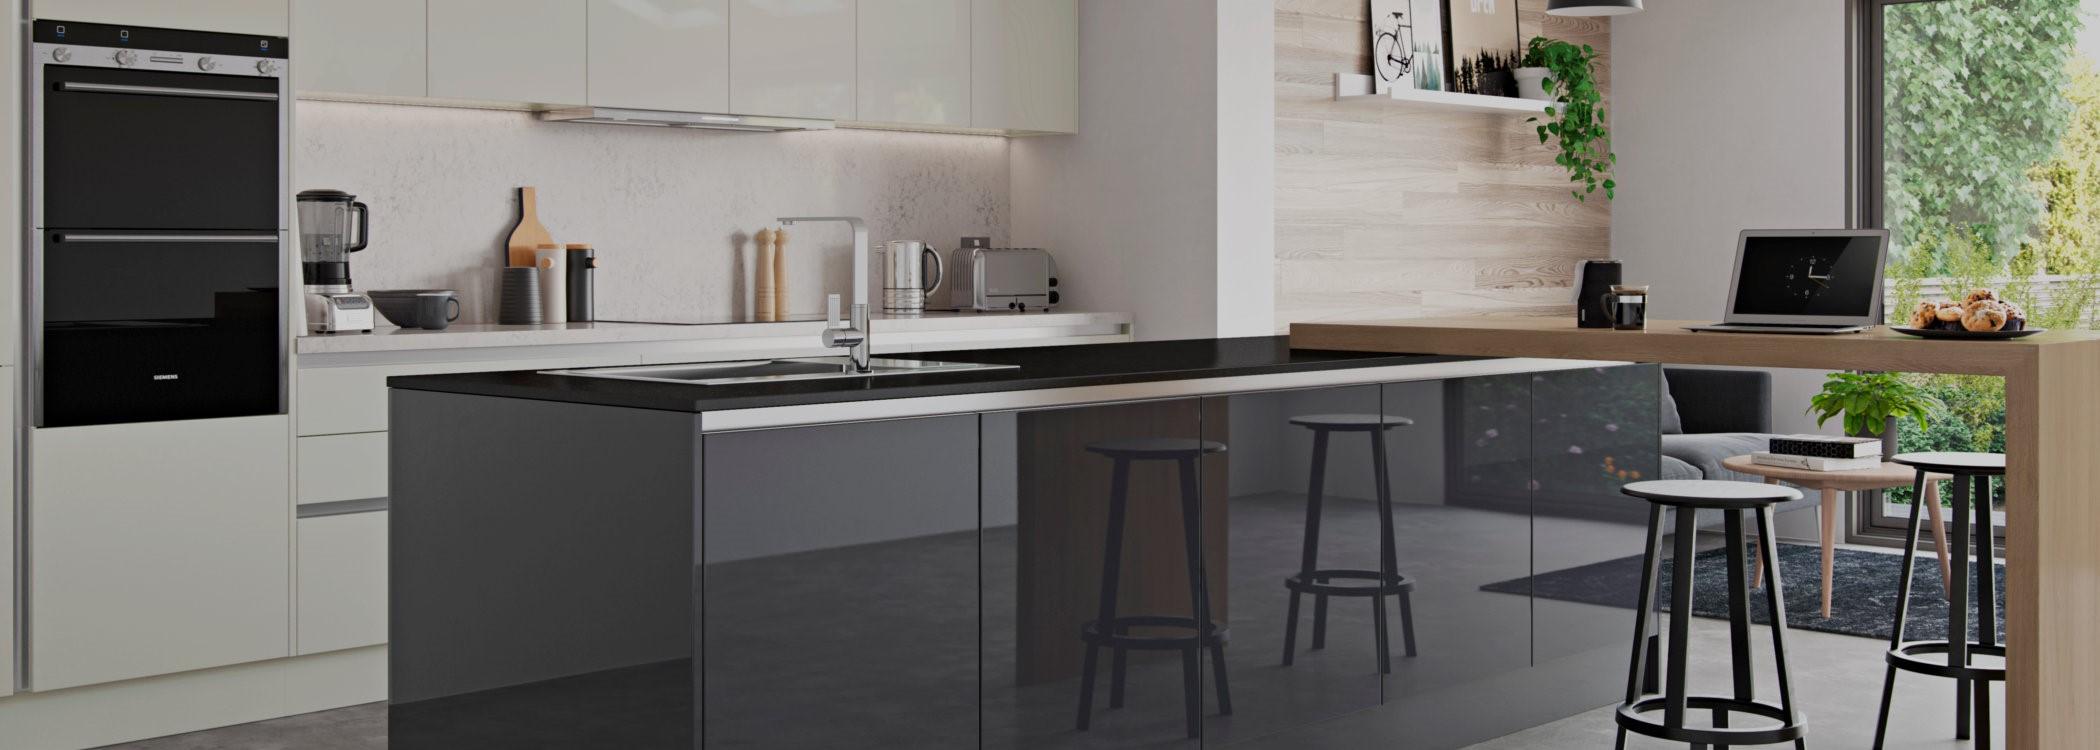 Quantum Aluma Croyde Kitchens